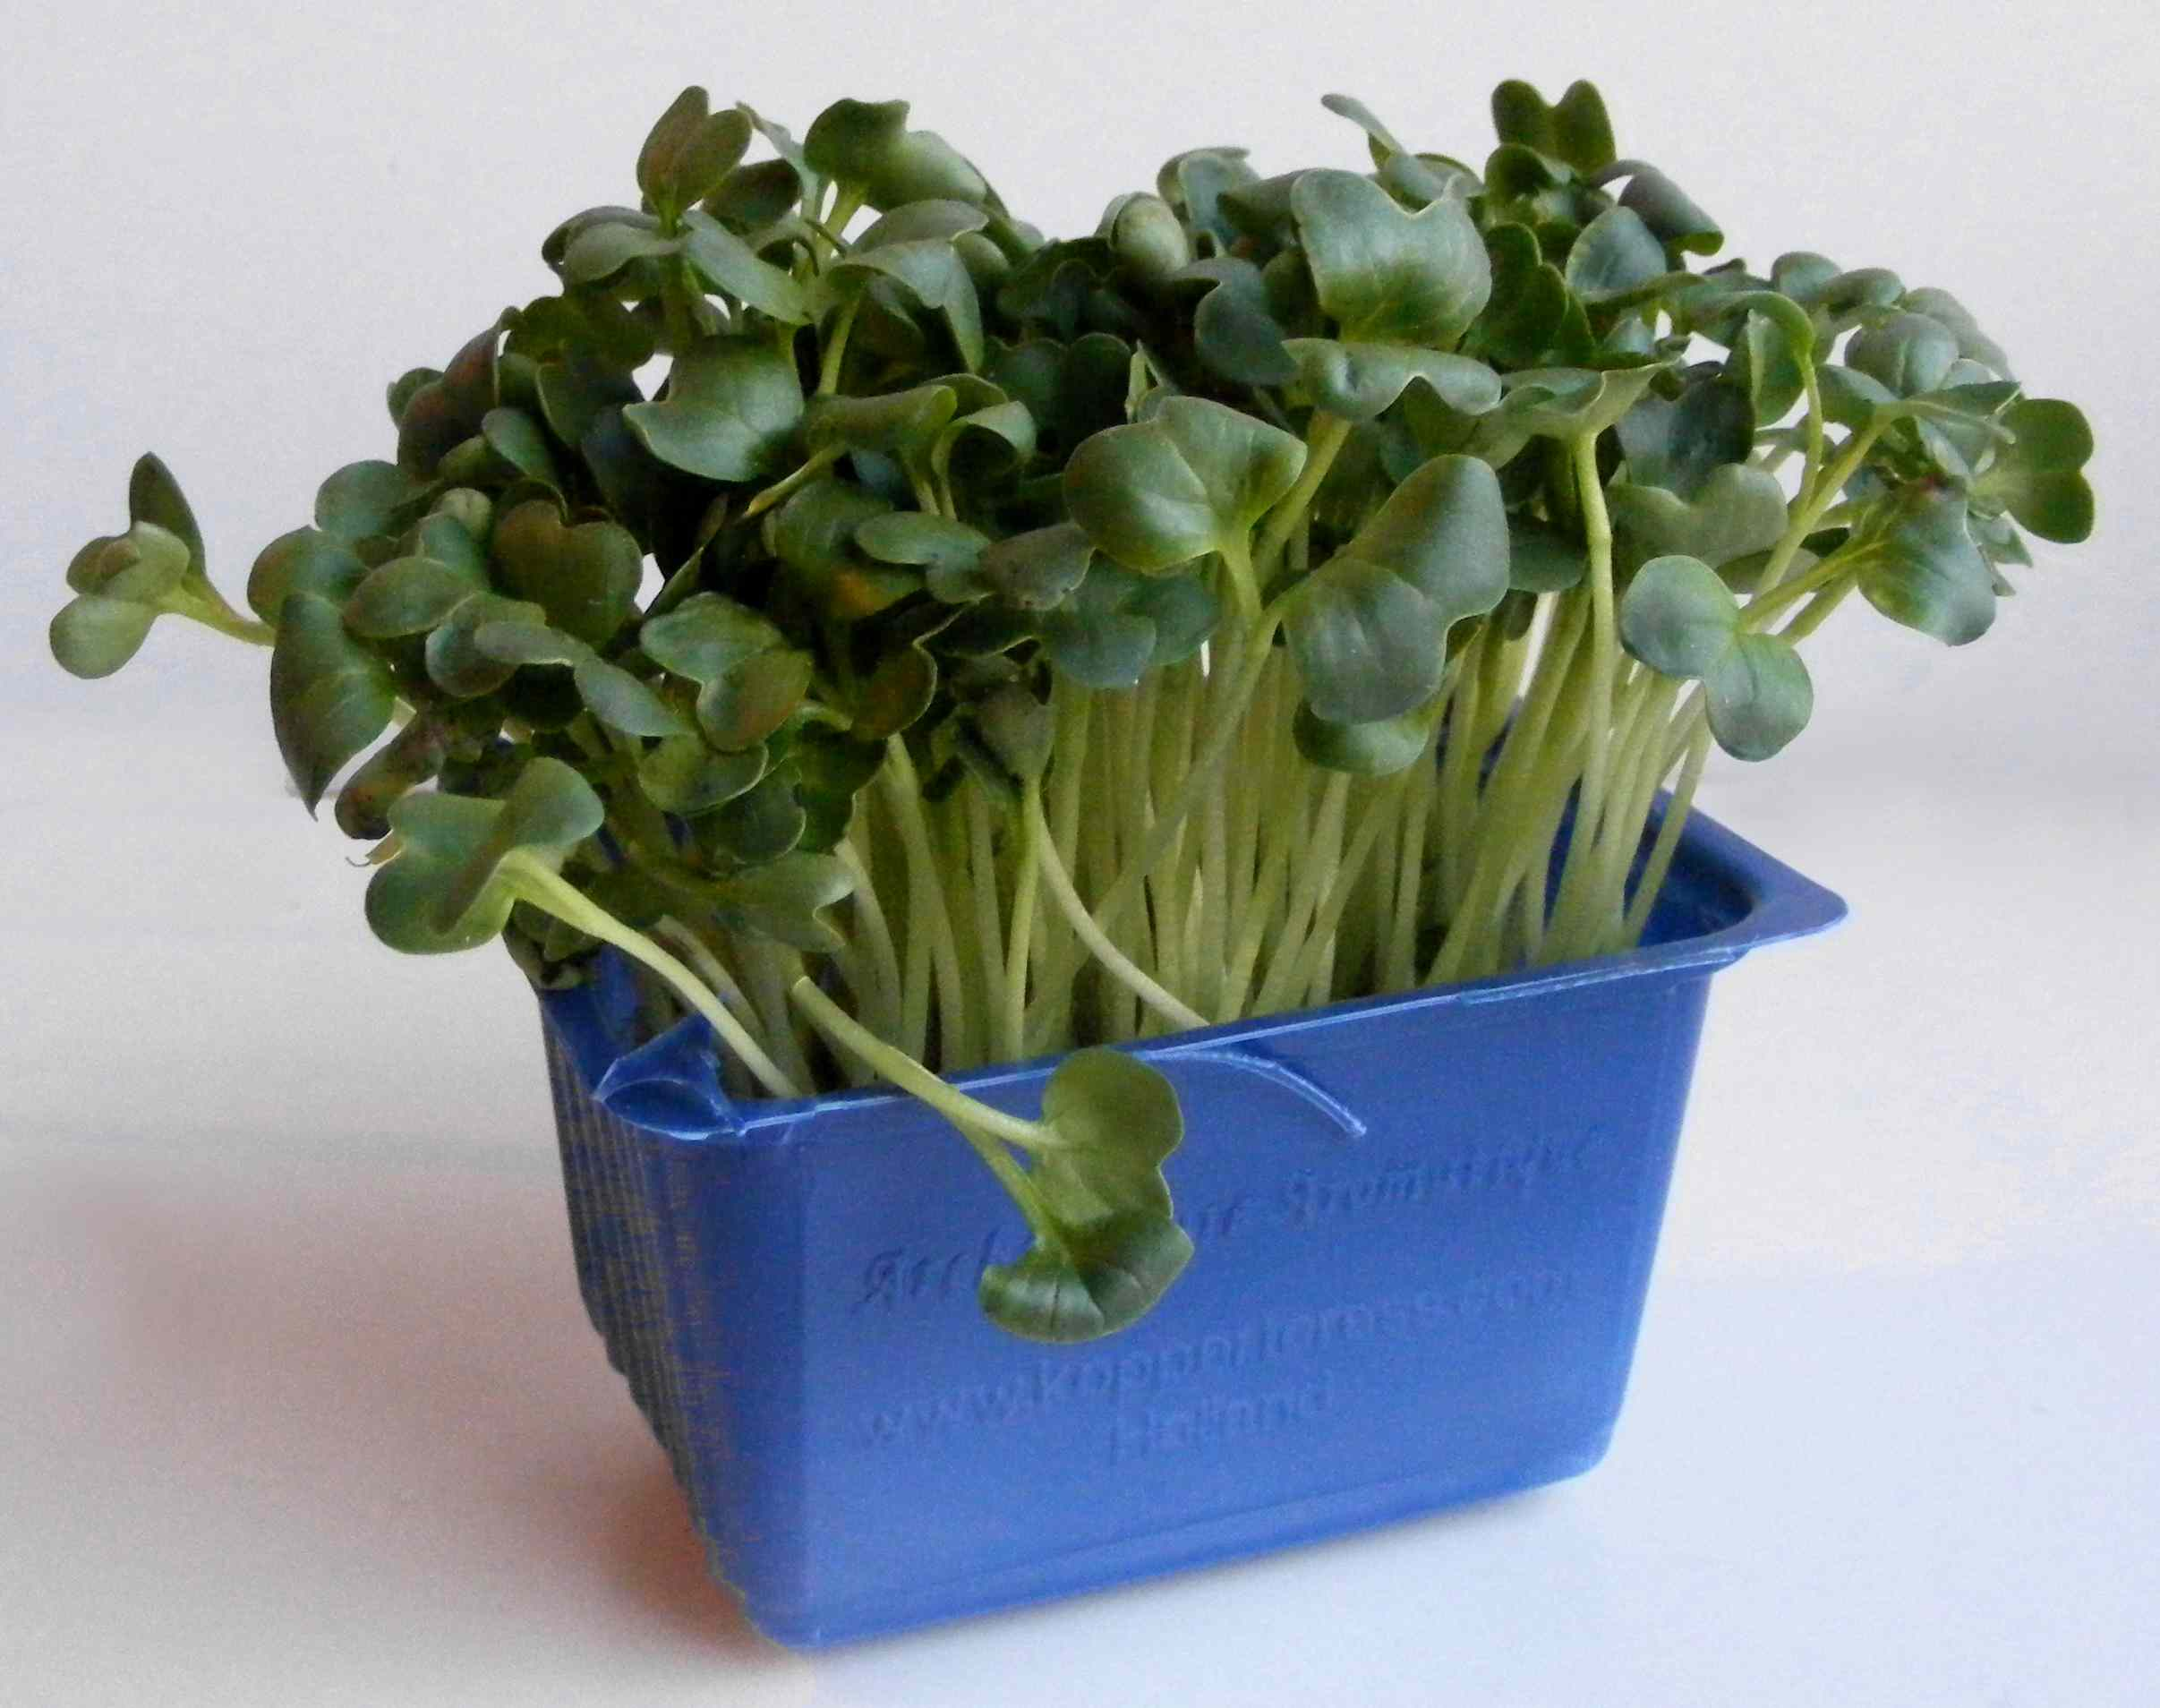 Daikon cress sprouts